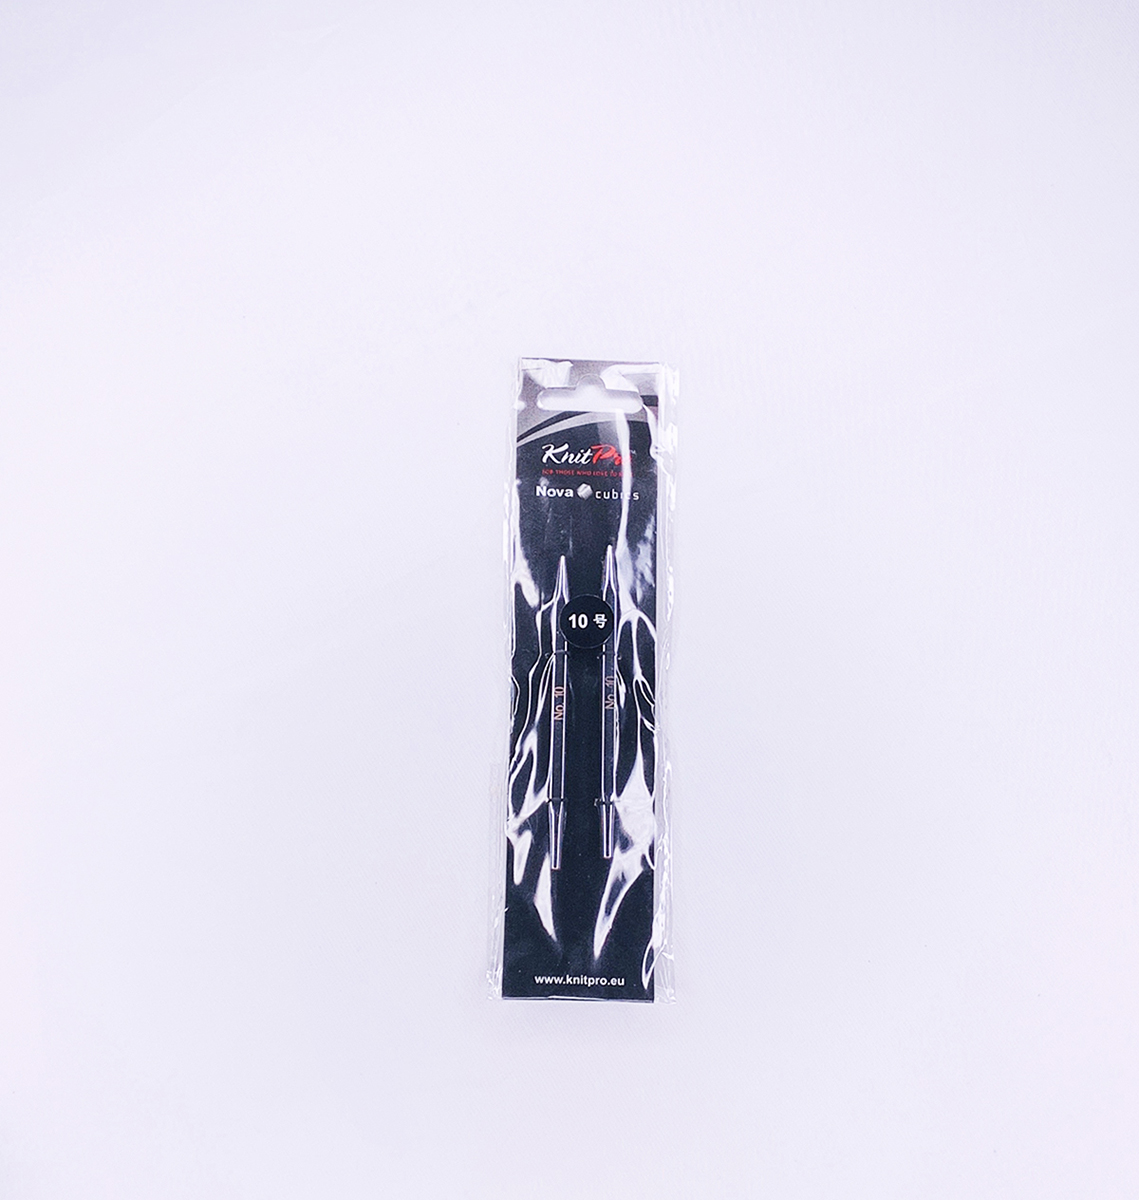 【Nova Cubics】☆付け替え可能輪針 ショート ニットプロ/ノバ・キュービックス